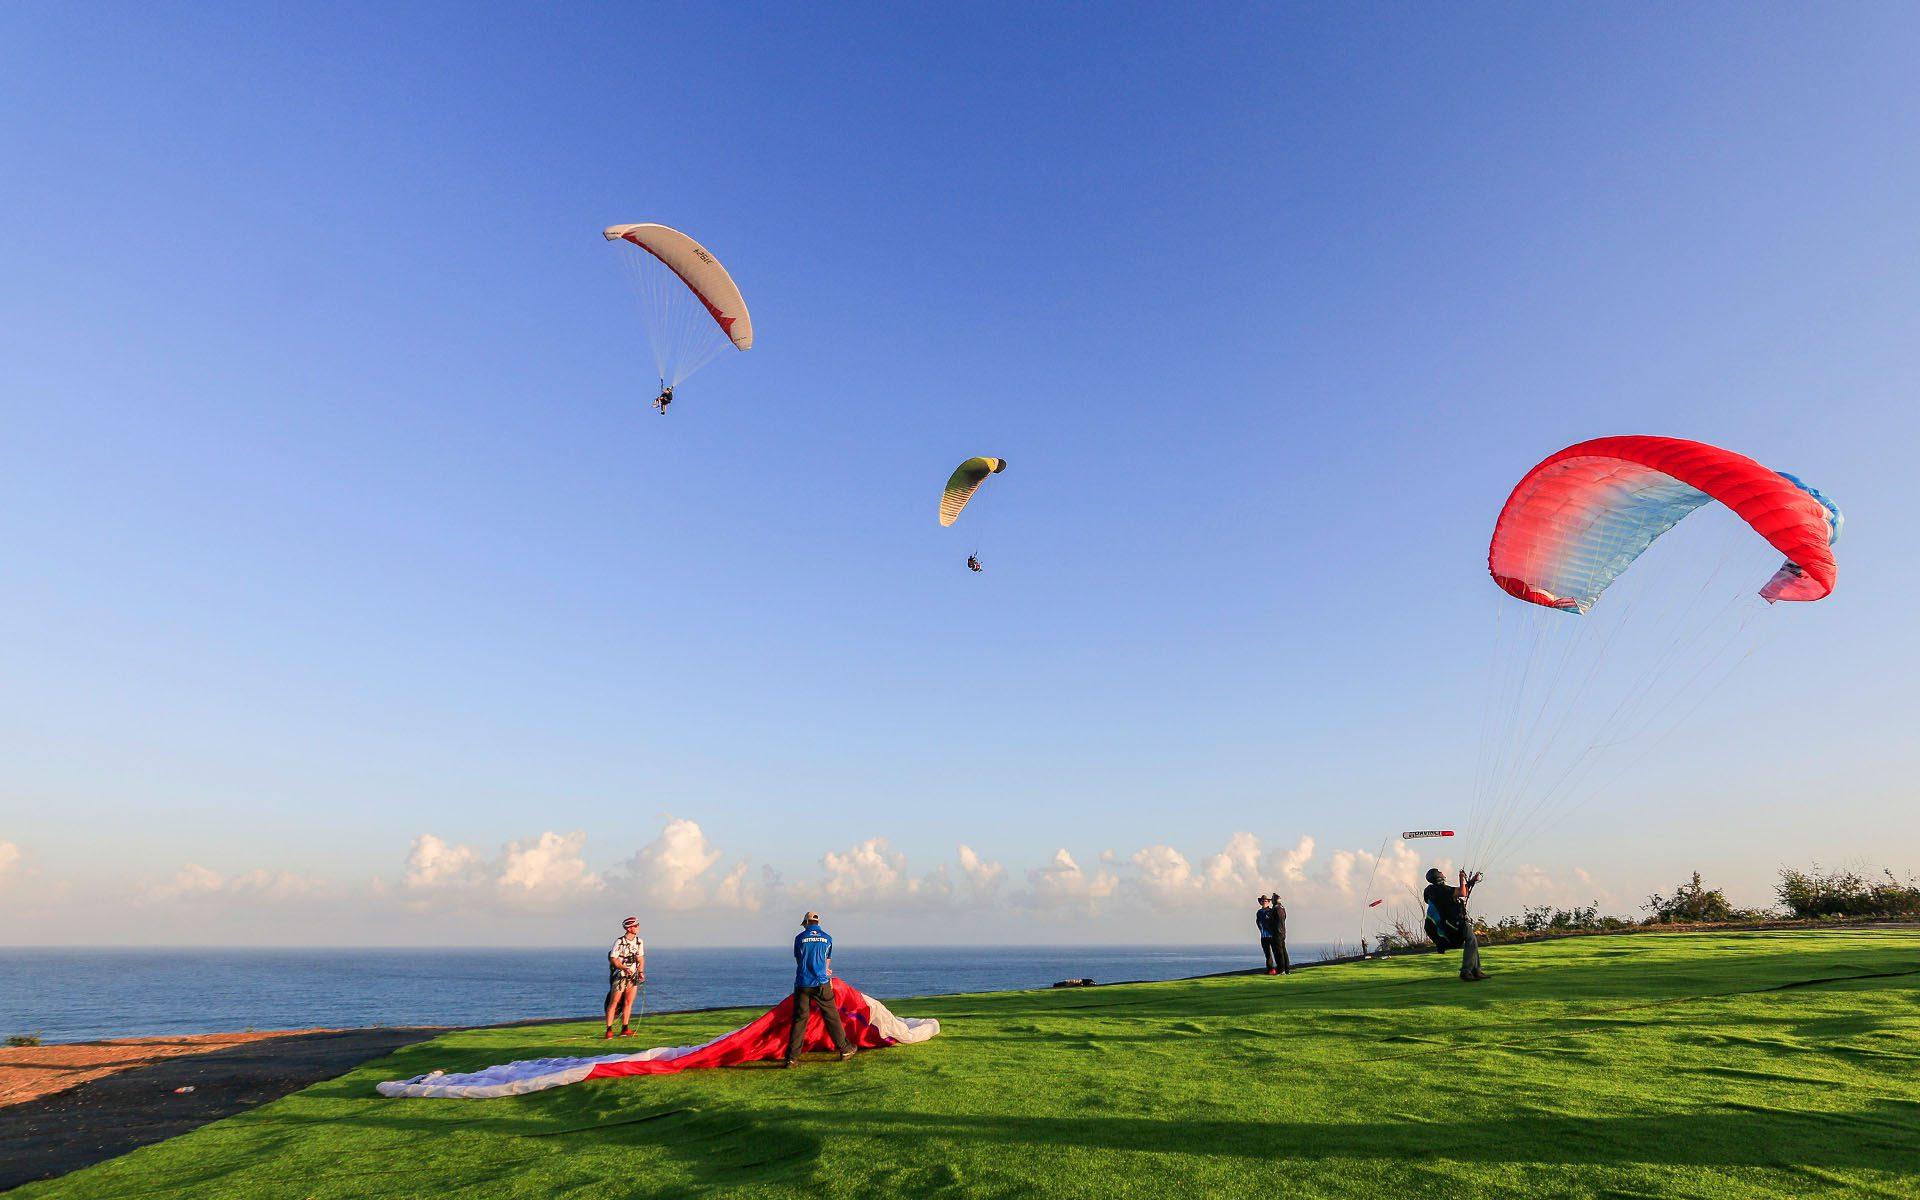 Riug Paragliding Take off area